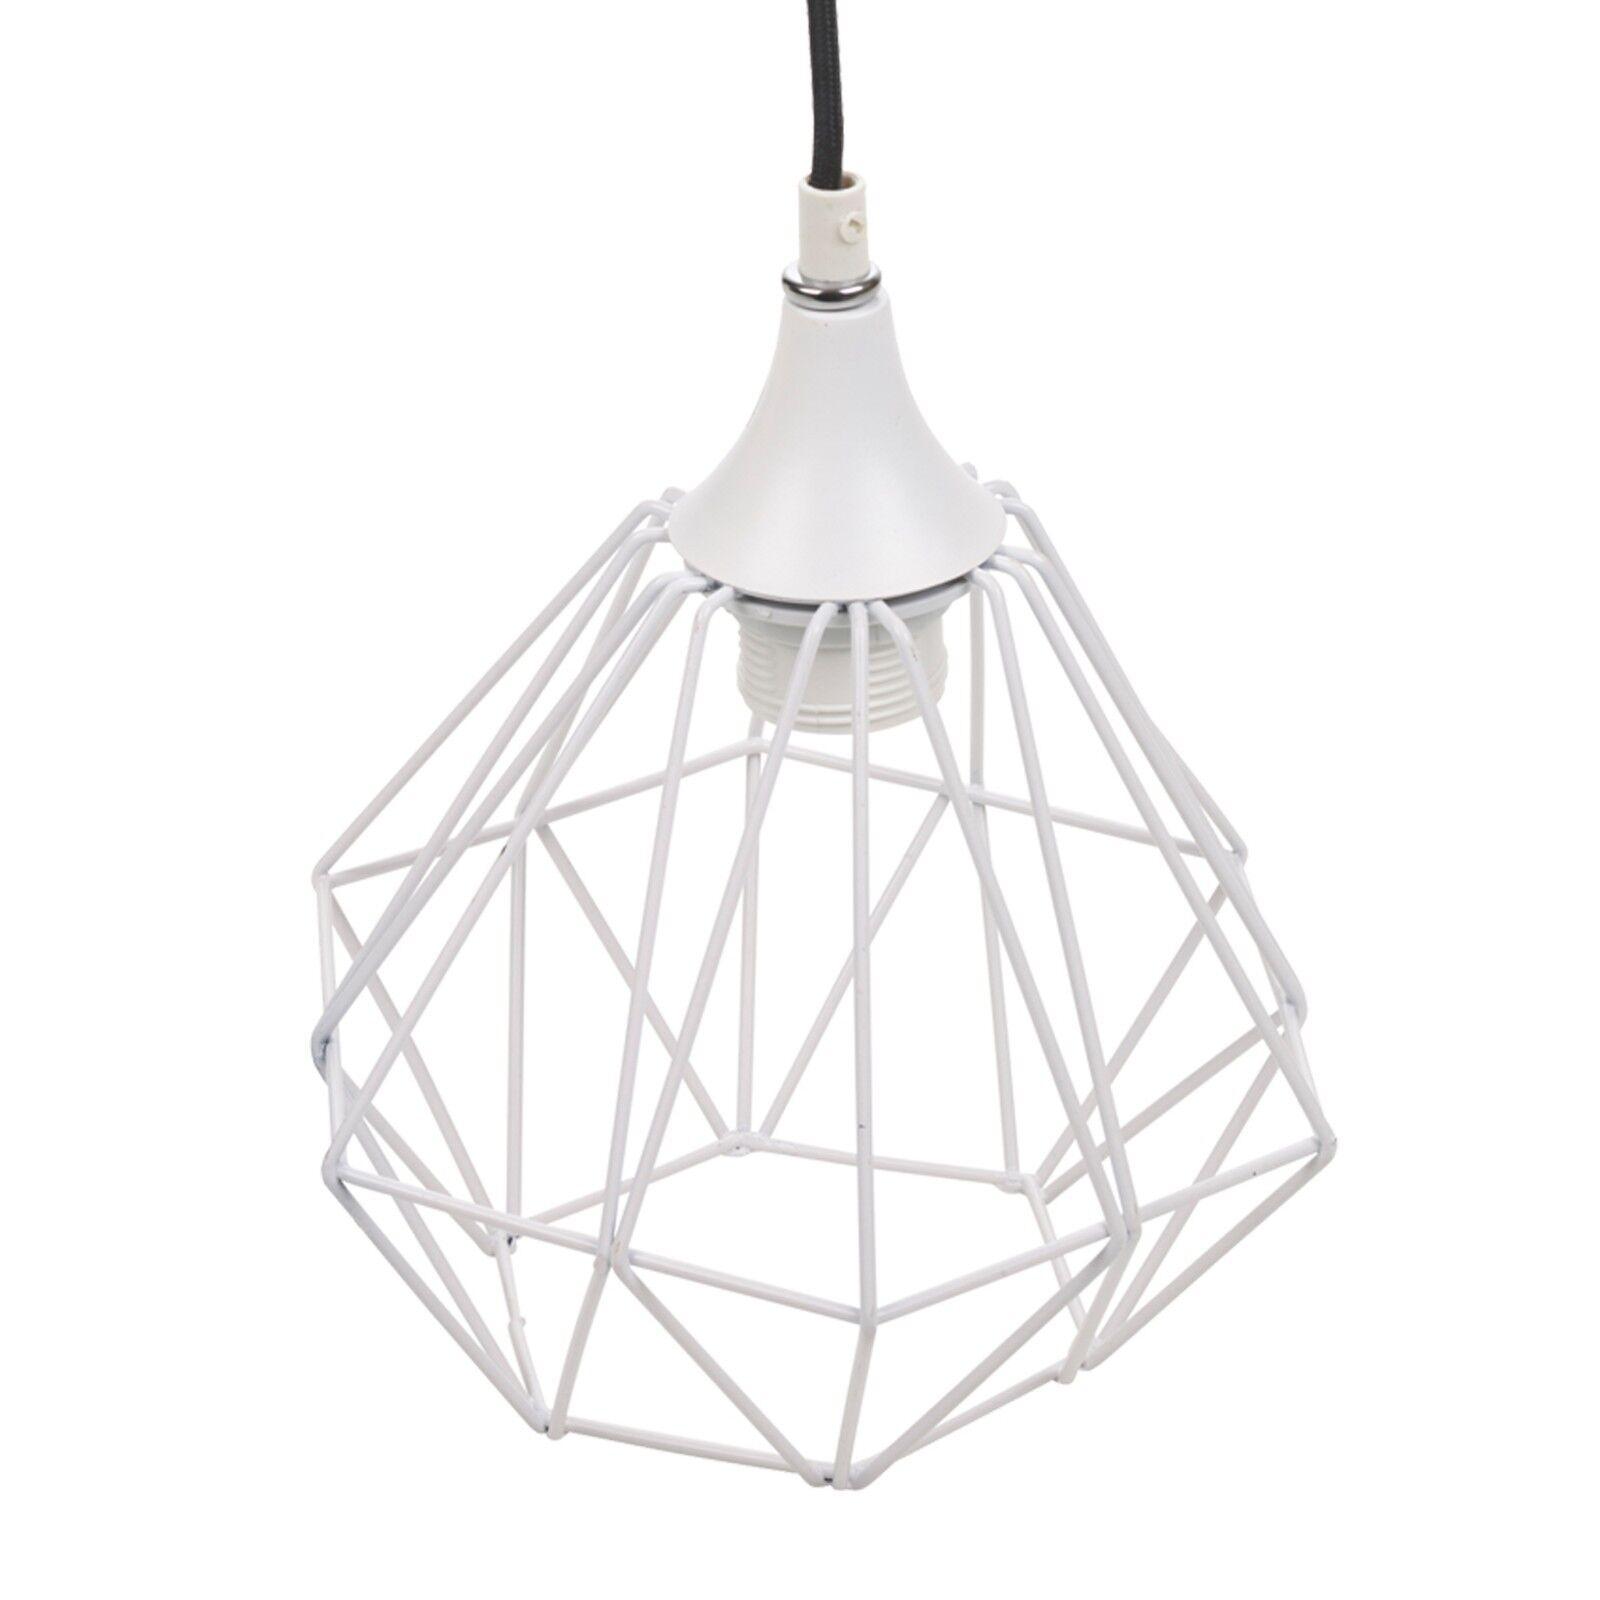 Modern White Geometric Metal Wire Hanging Ceiling Light